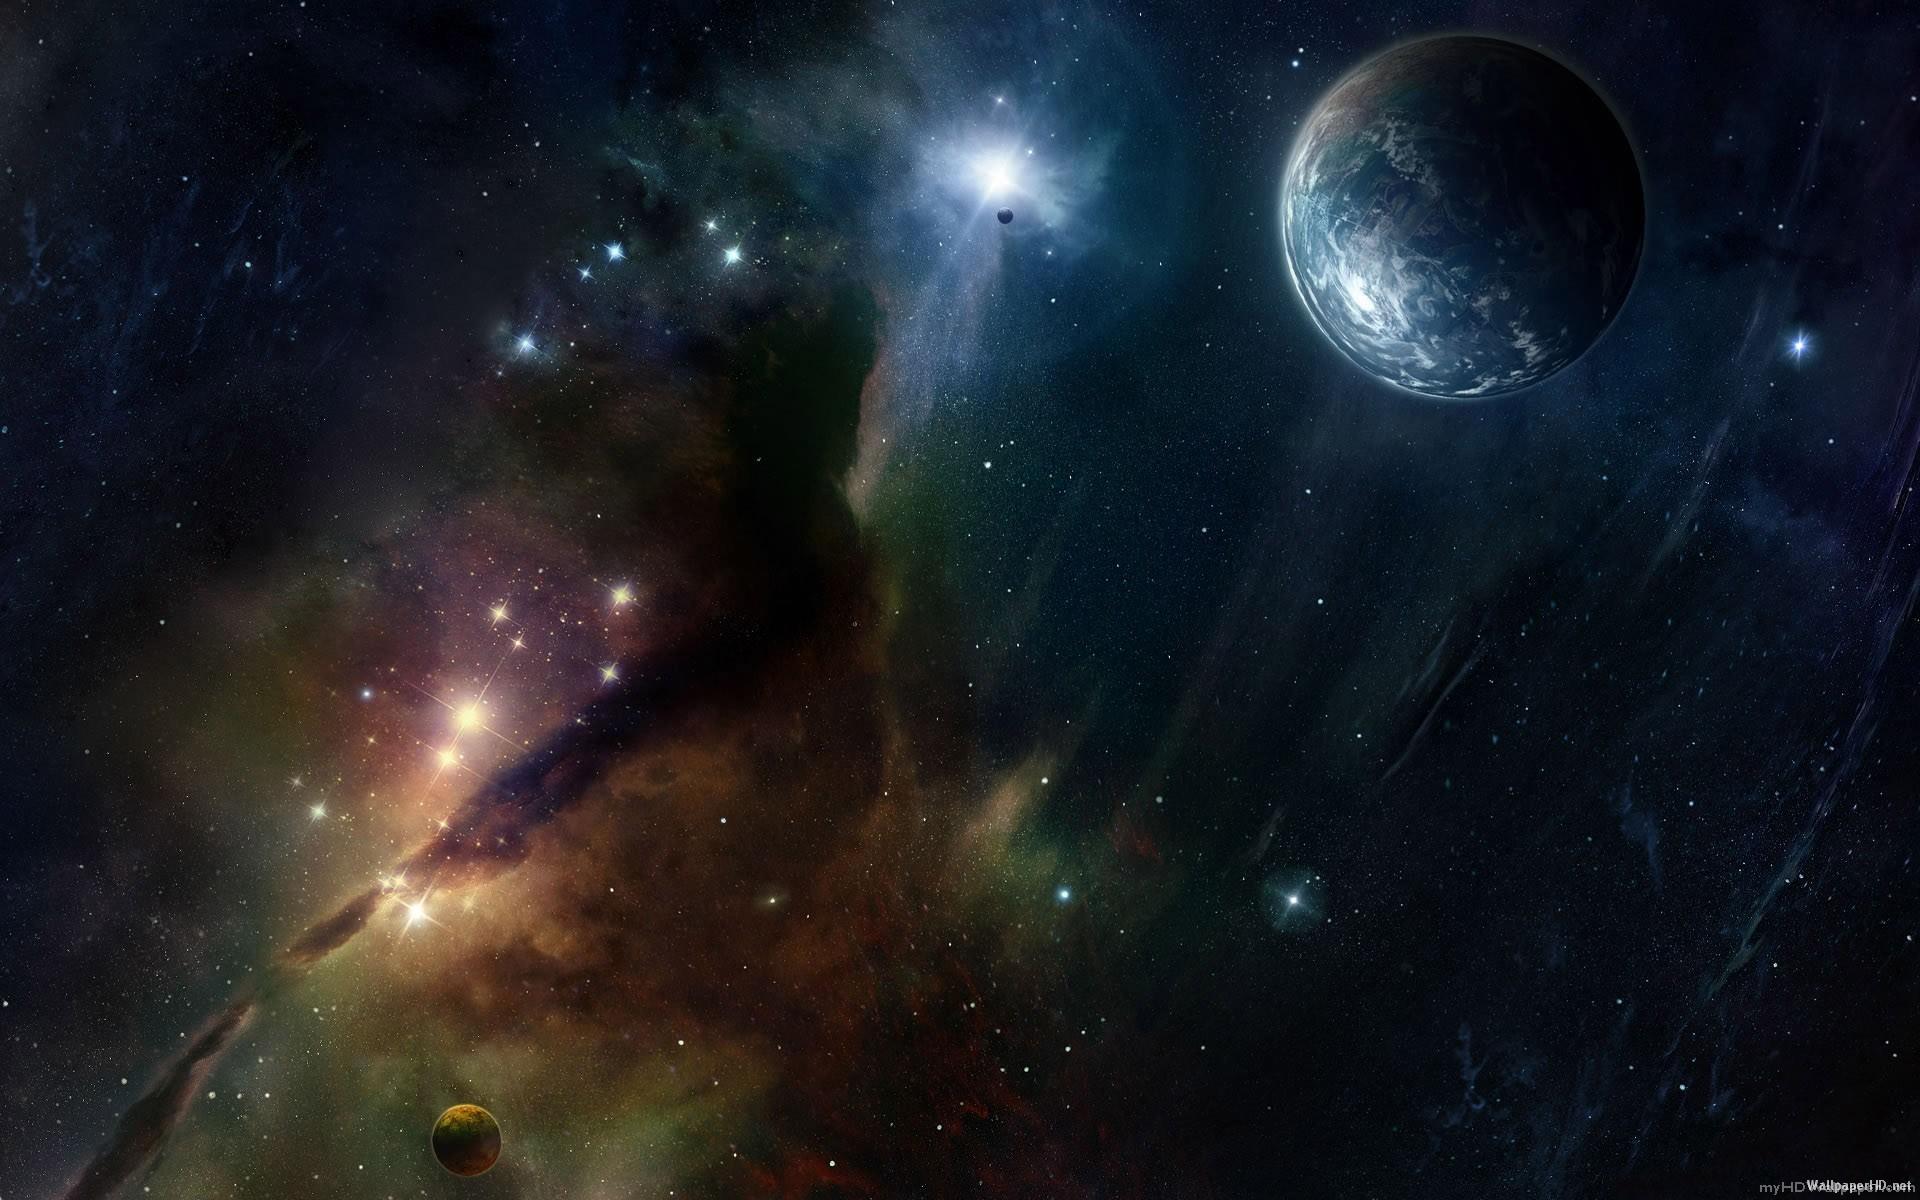 hd space wallpaper hd space wallpaper